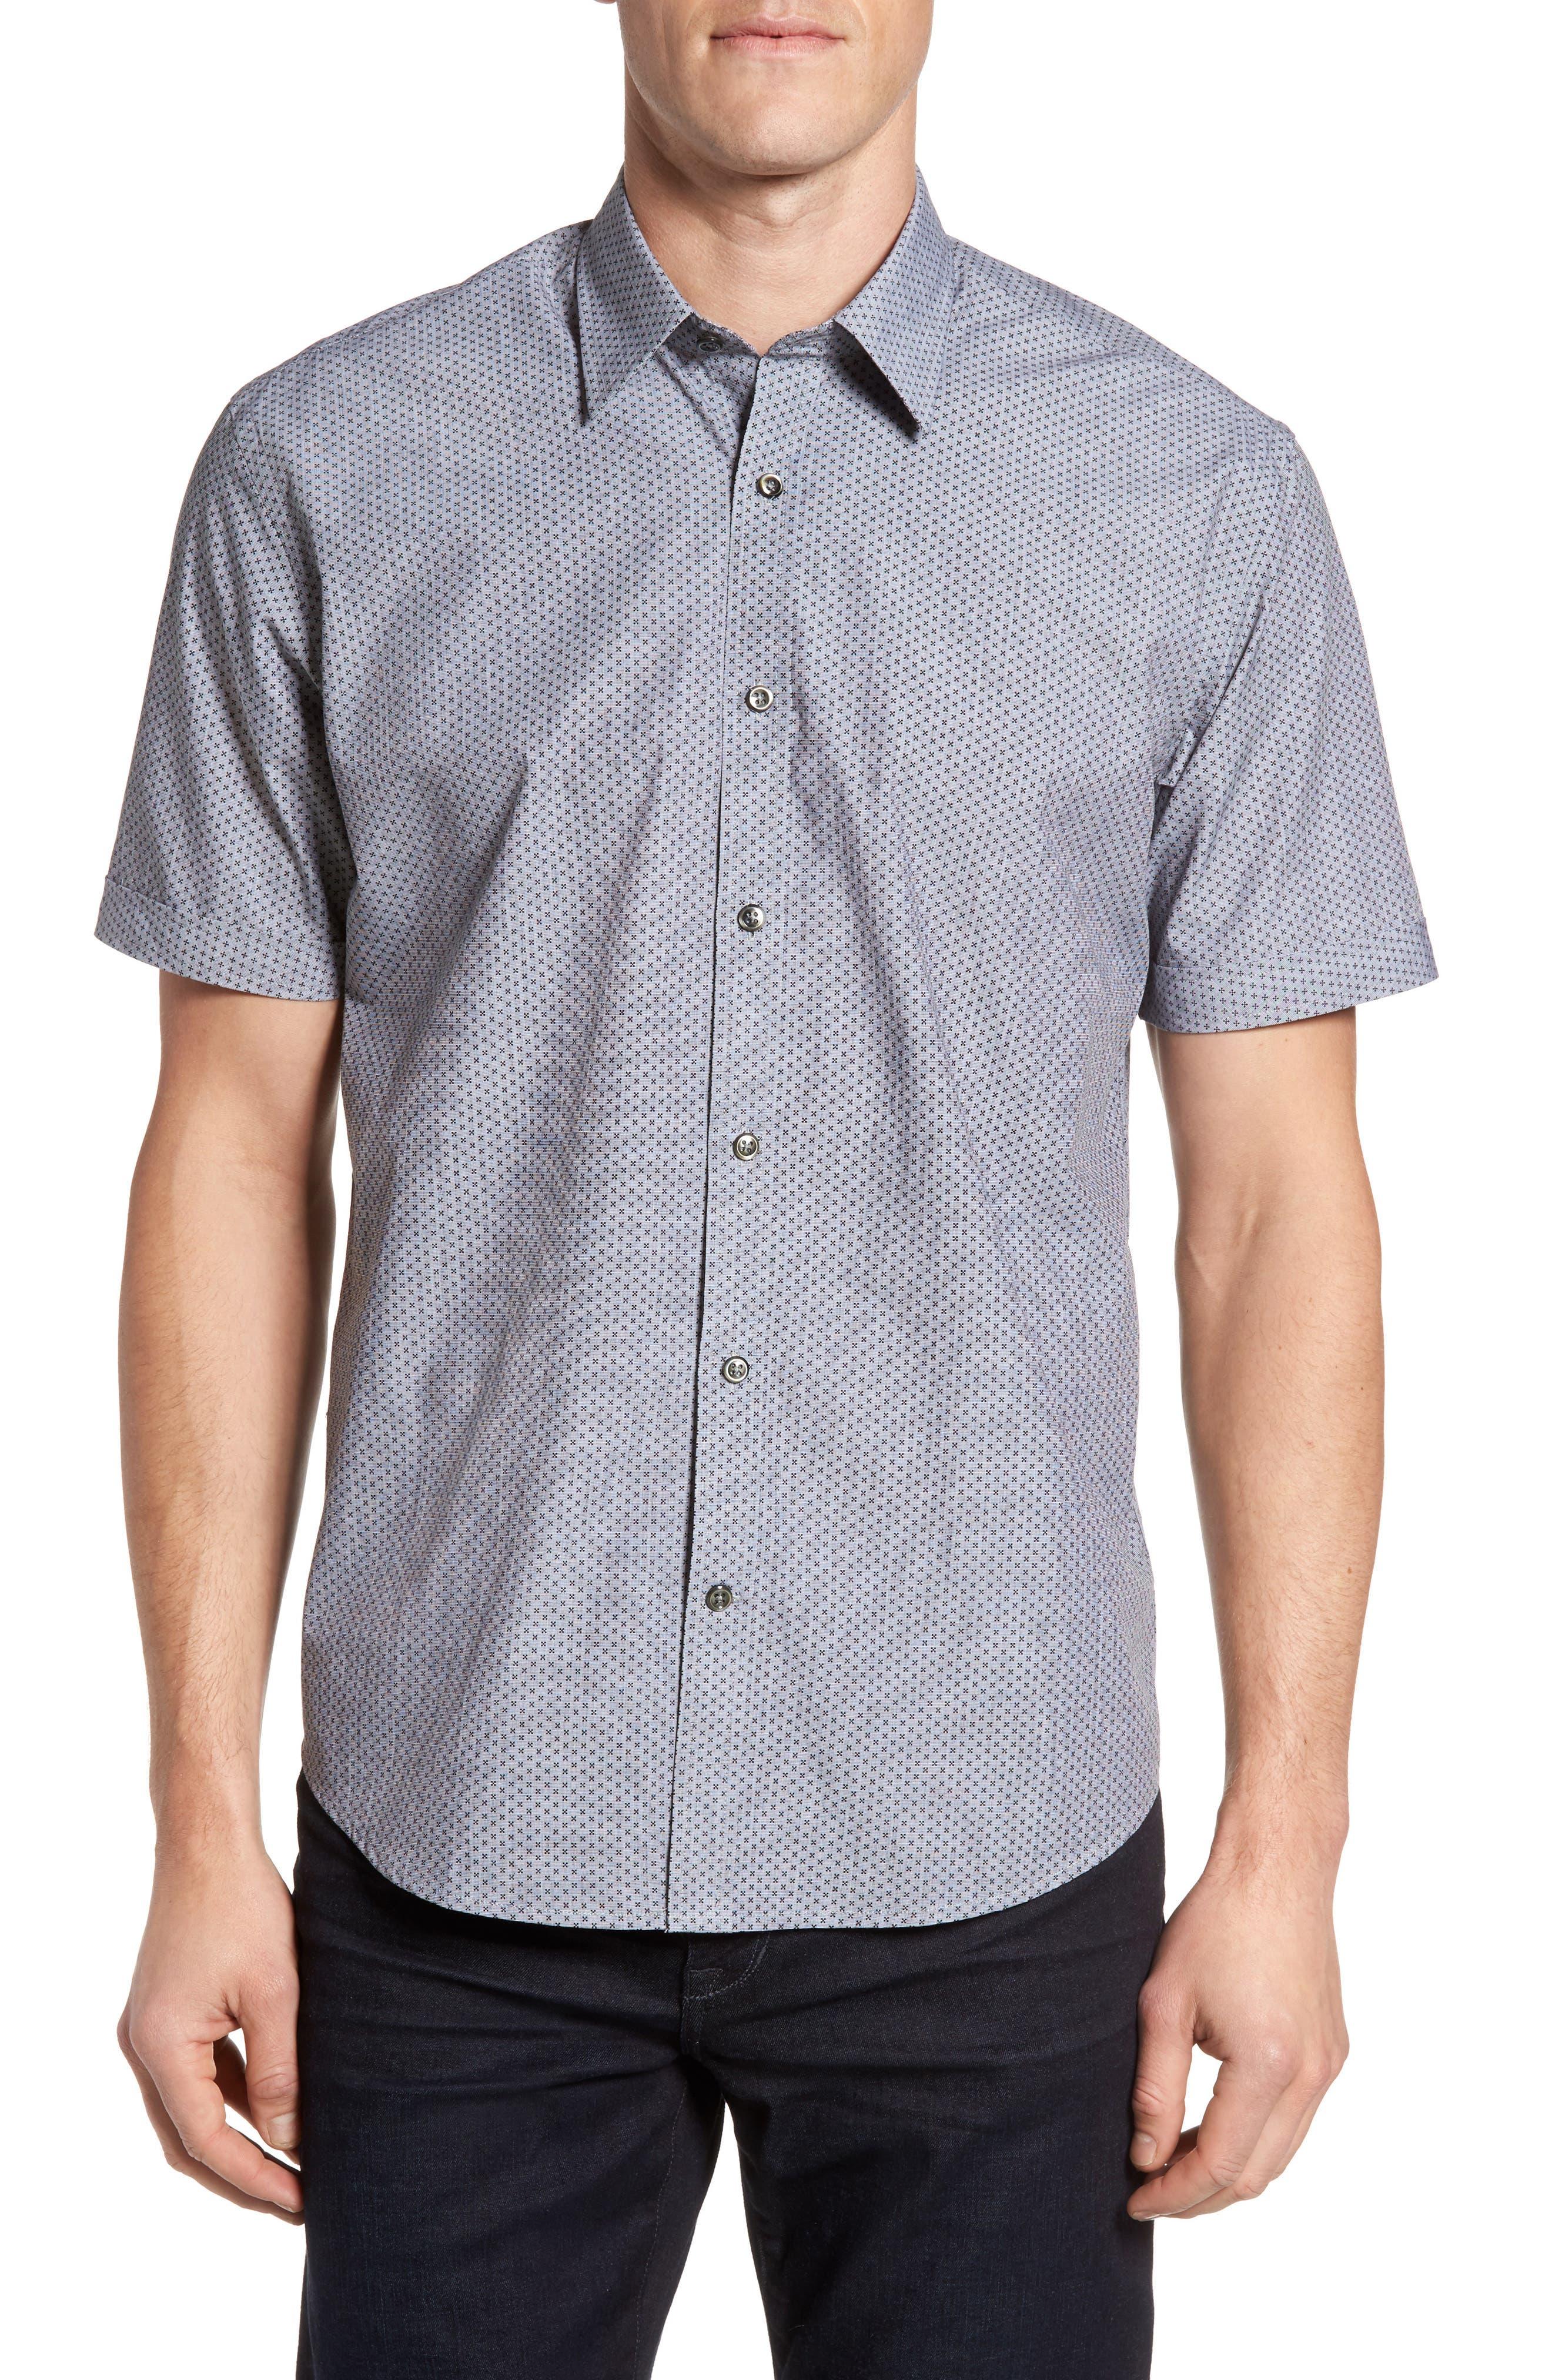 James Campbell Iona Regular Fit Short Sleeve Sport Shirt